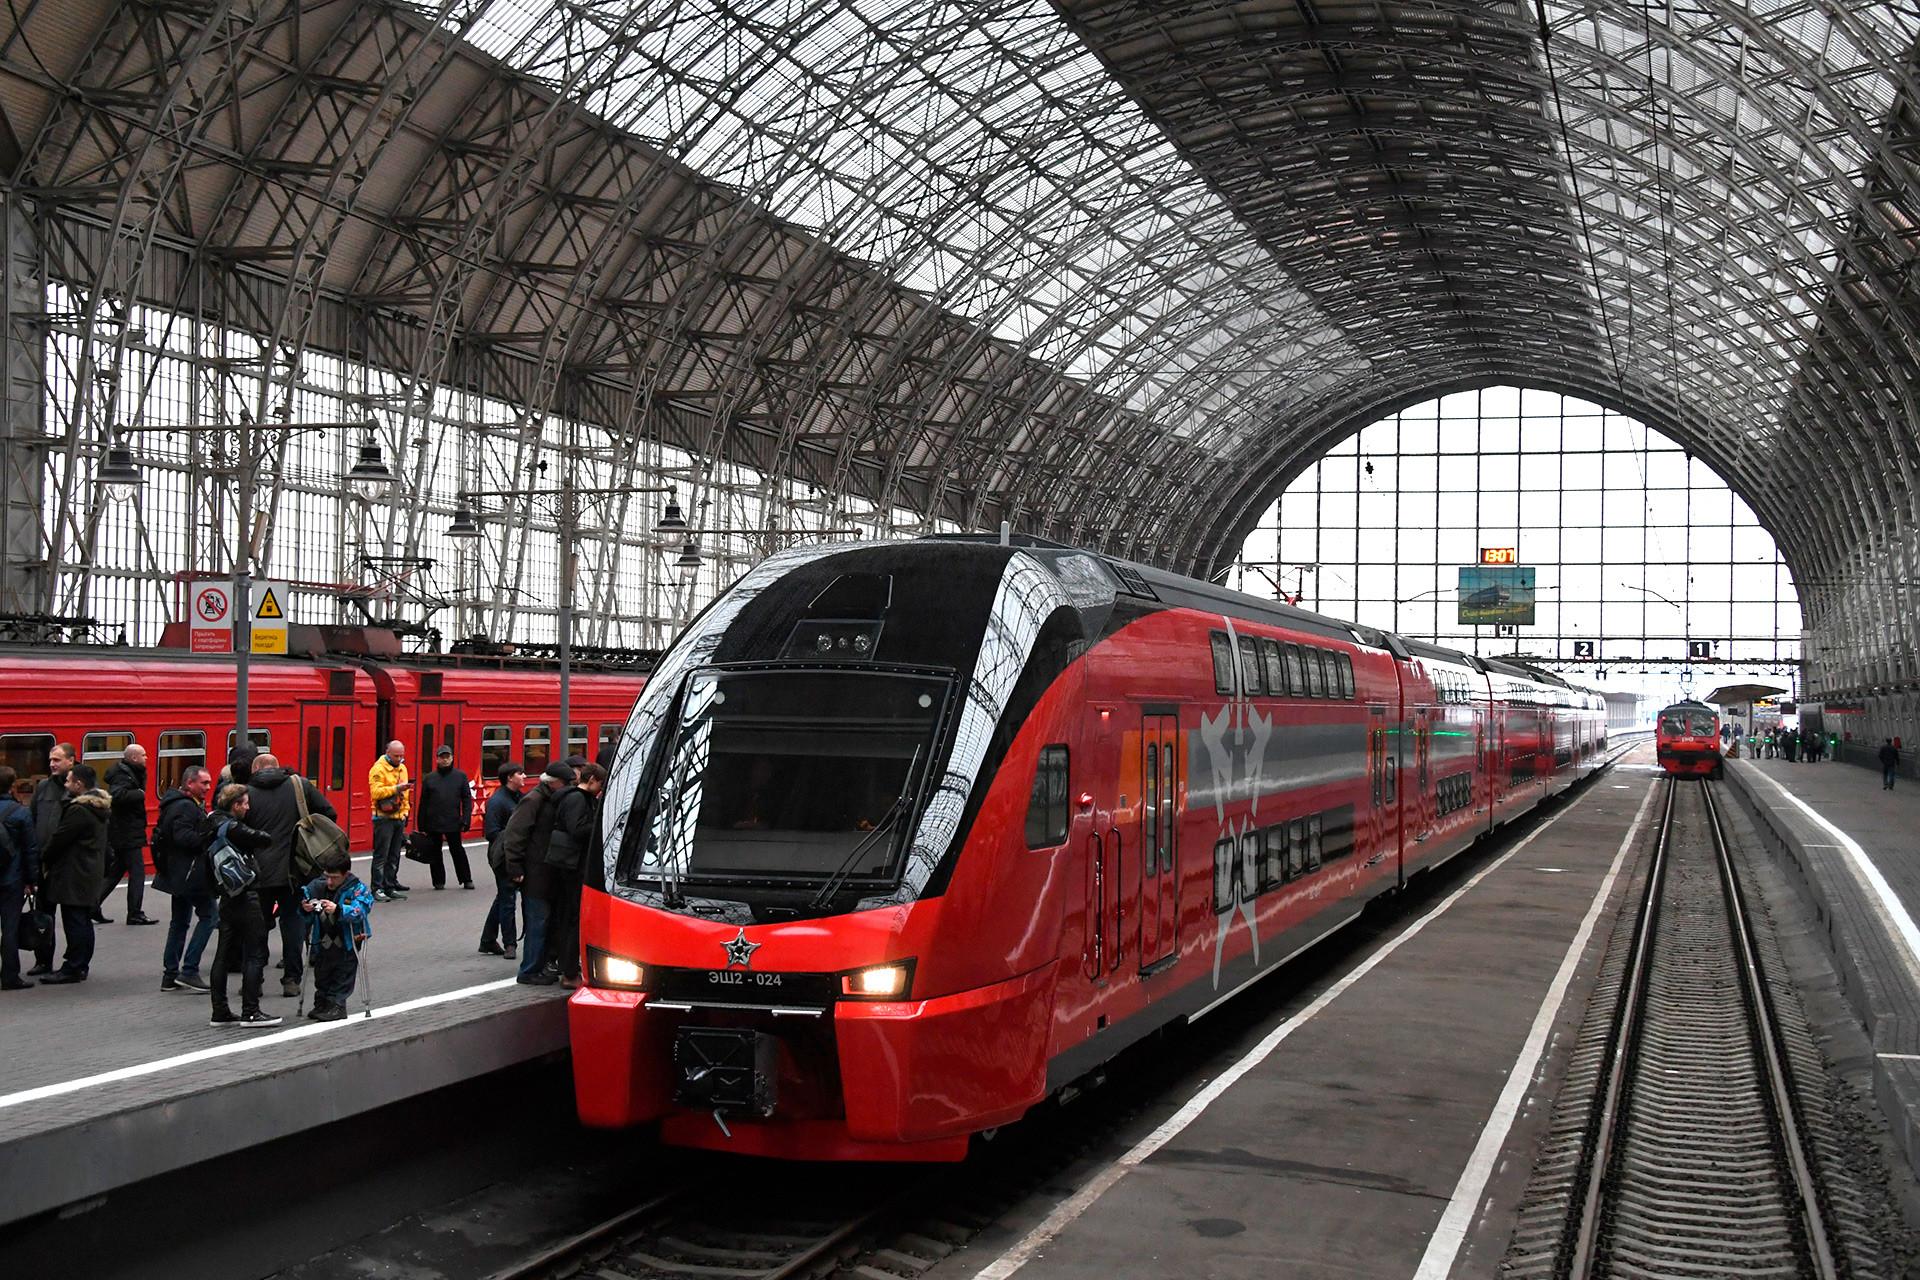 Kereta Aeroexpress dua tingkat pertama dalam seremoni peluncurannya di Stasiun Kievsky, Moskow.